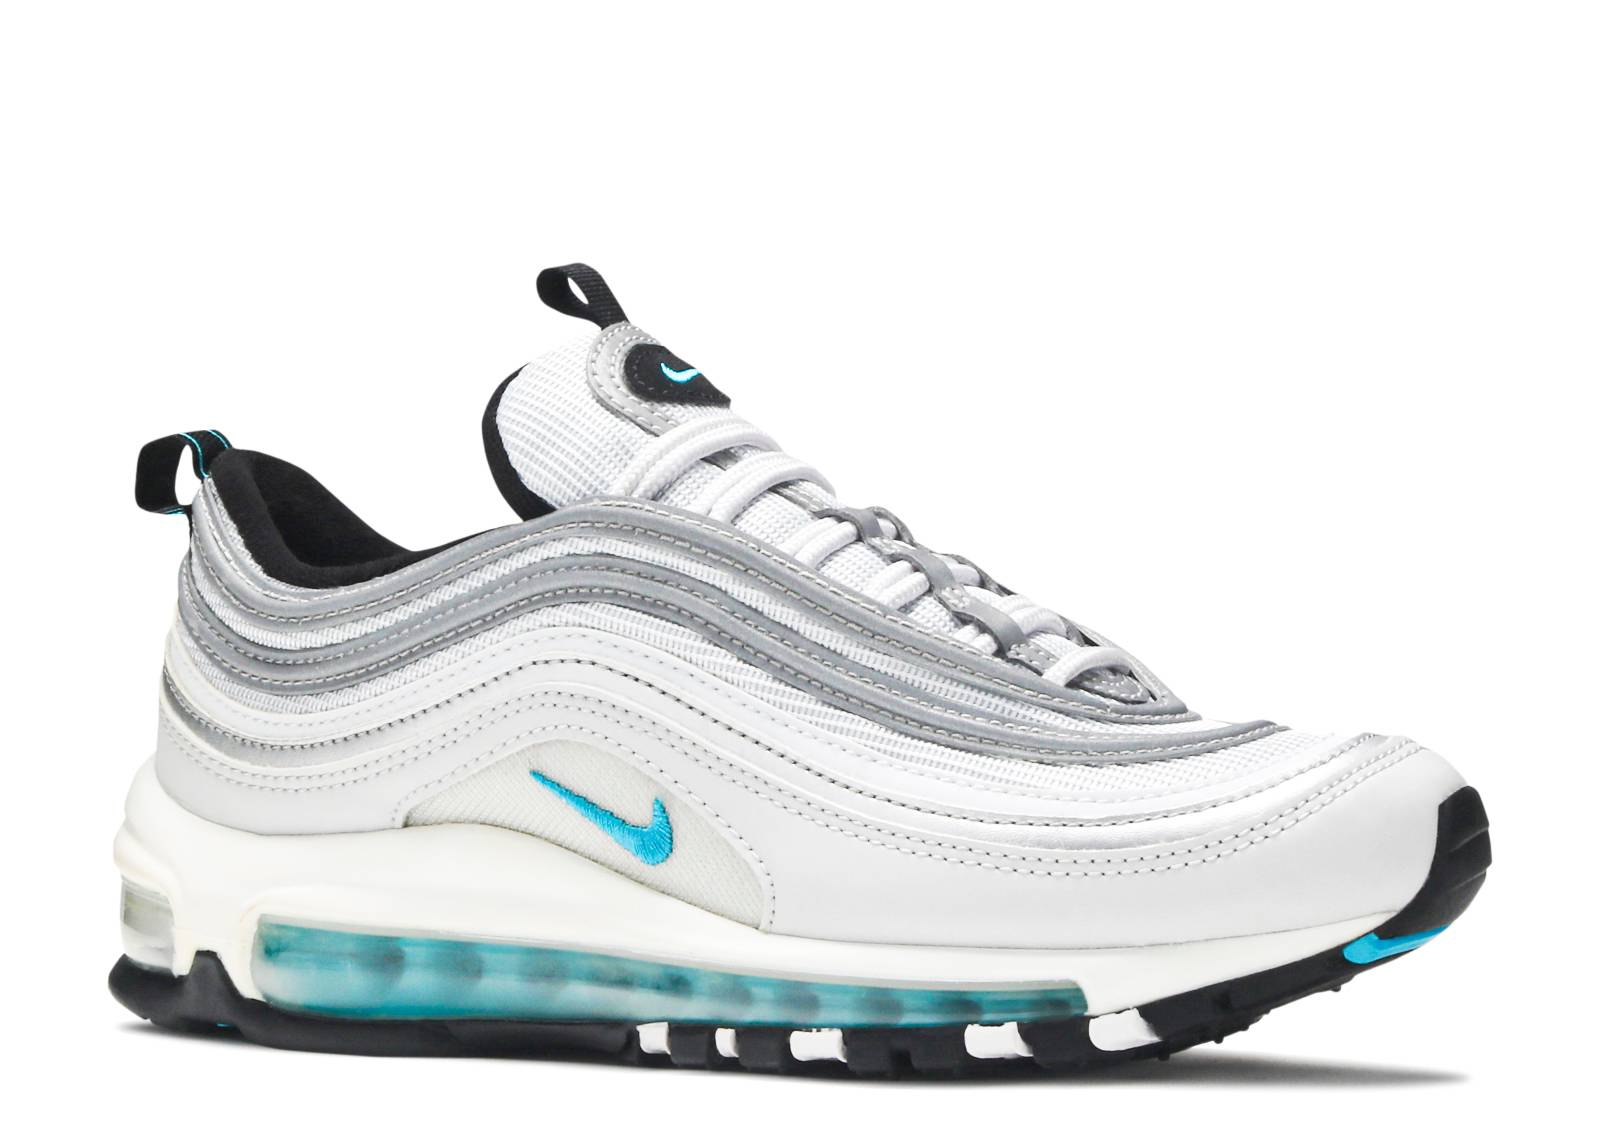 premium selection 0bea7 a5269 W Air Max 97 Qs - Nike - 917647 001 - pure platinum marina blue   Flight  Club